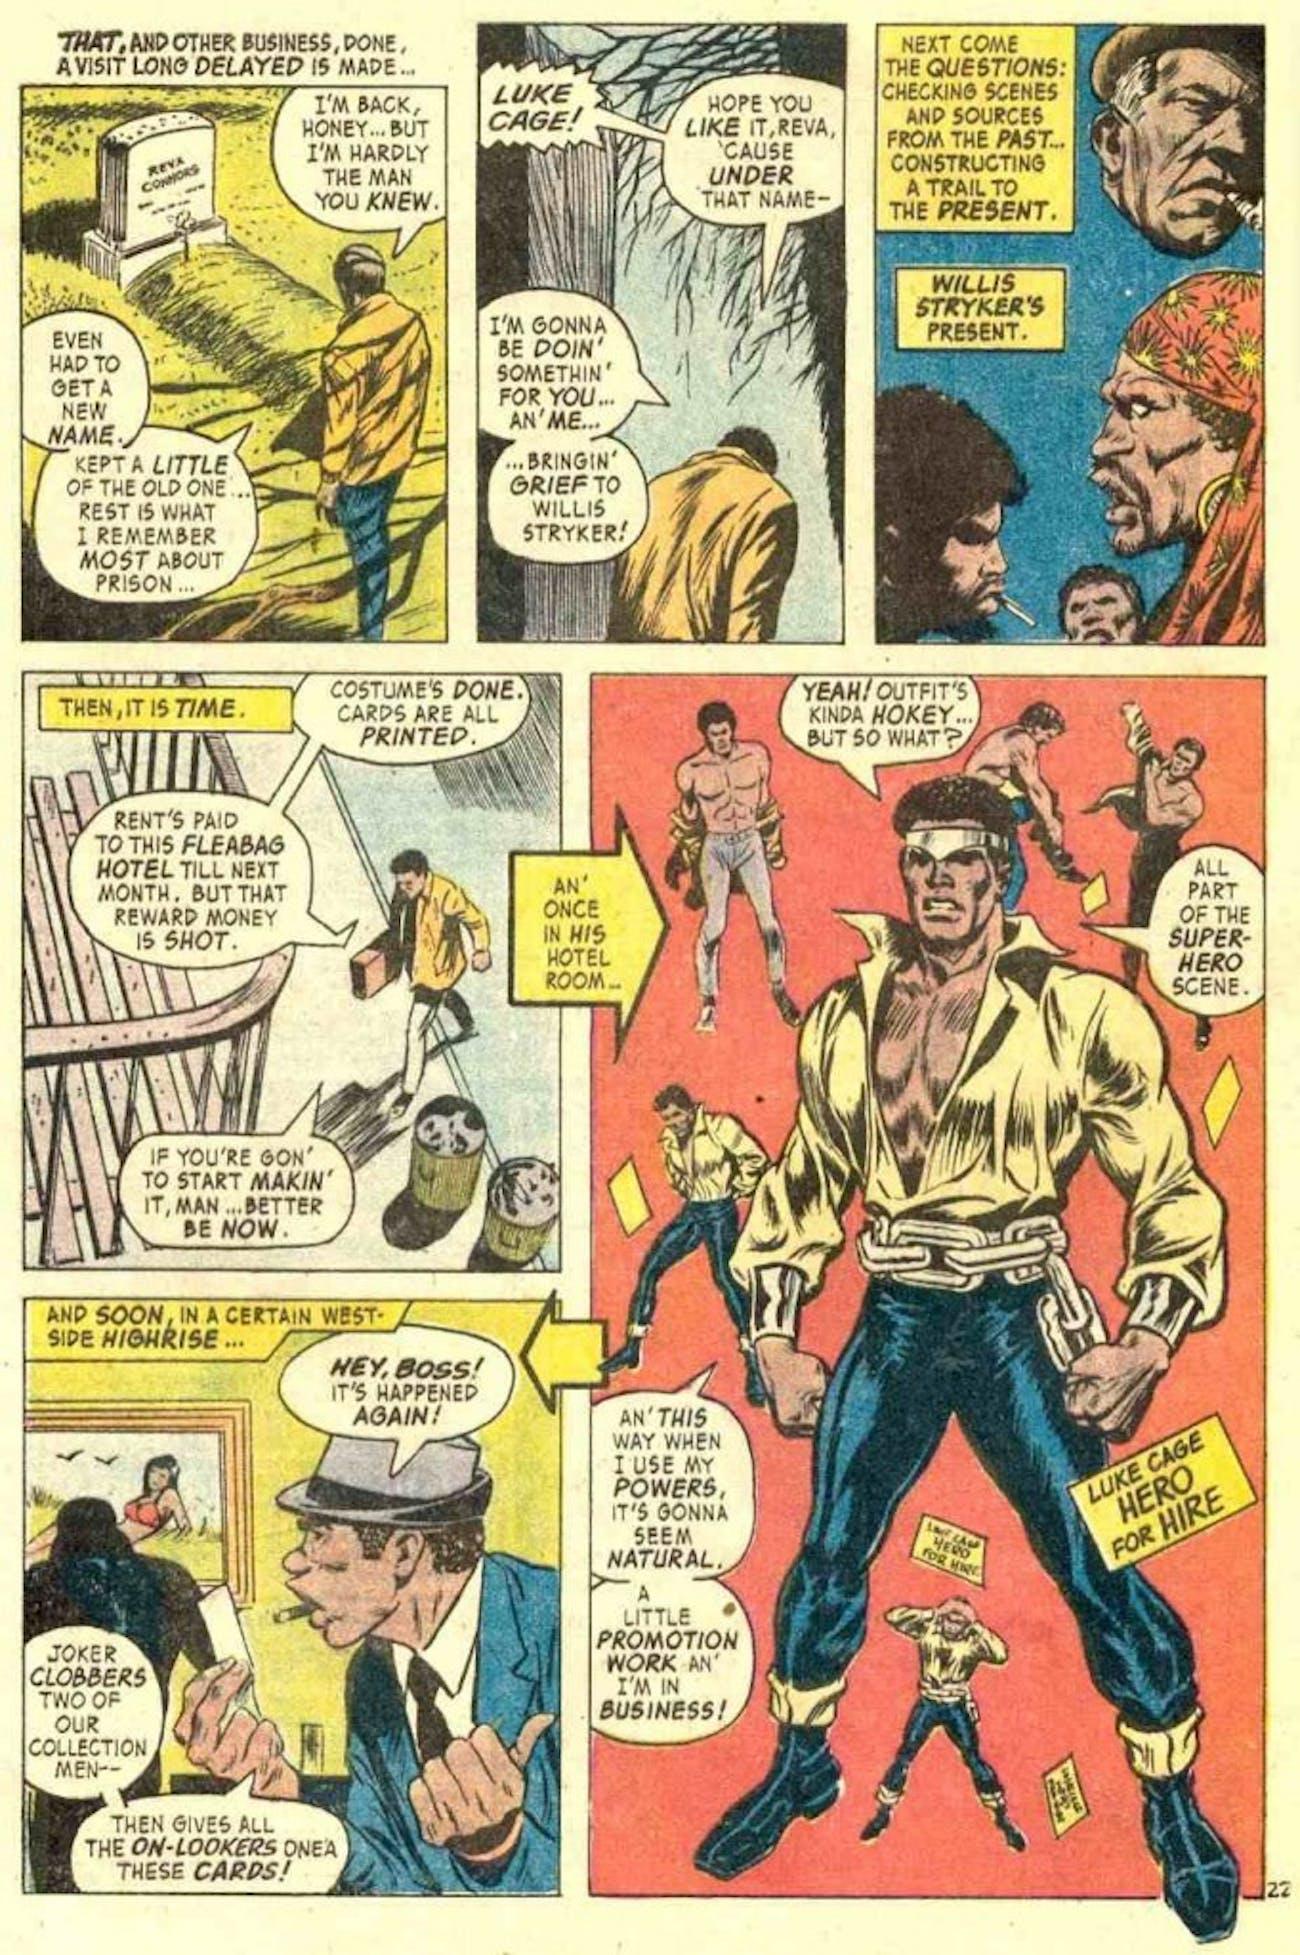 Luke Cage Marvel Comics